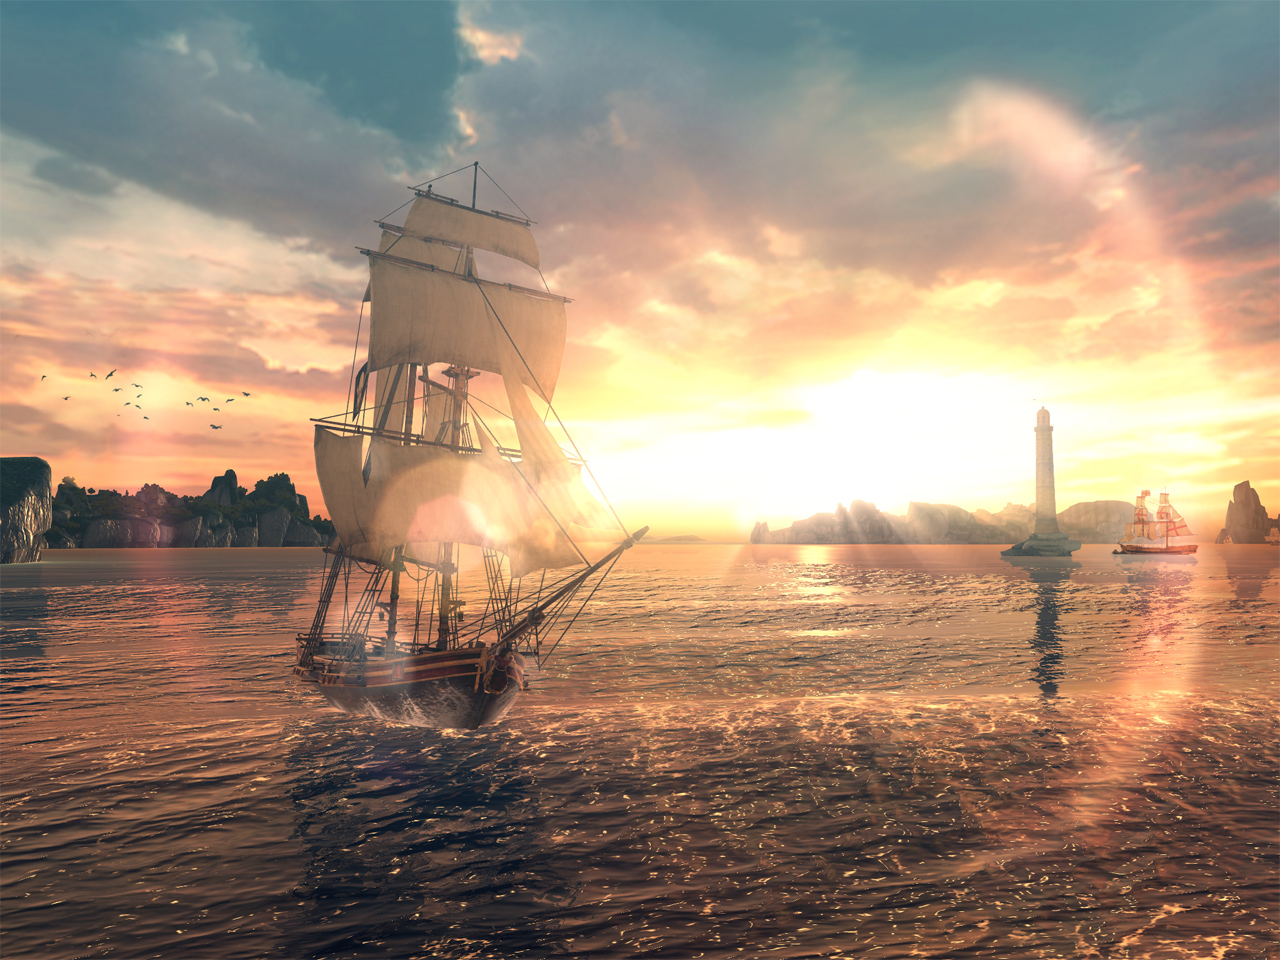 Ubisoft 宣布《刺客教條:海盜奇航》航向行動裝置 12 月 6 日同步推出中文版